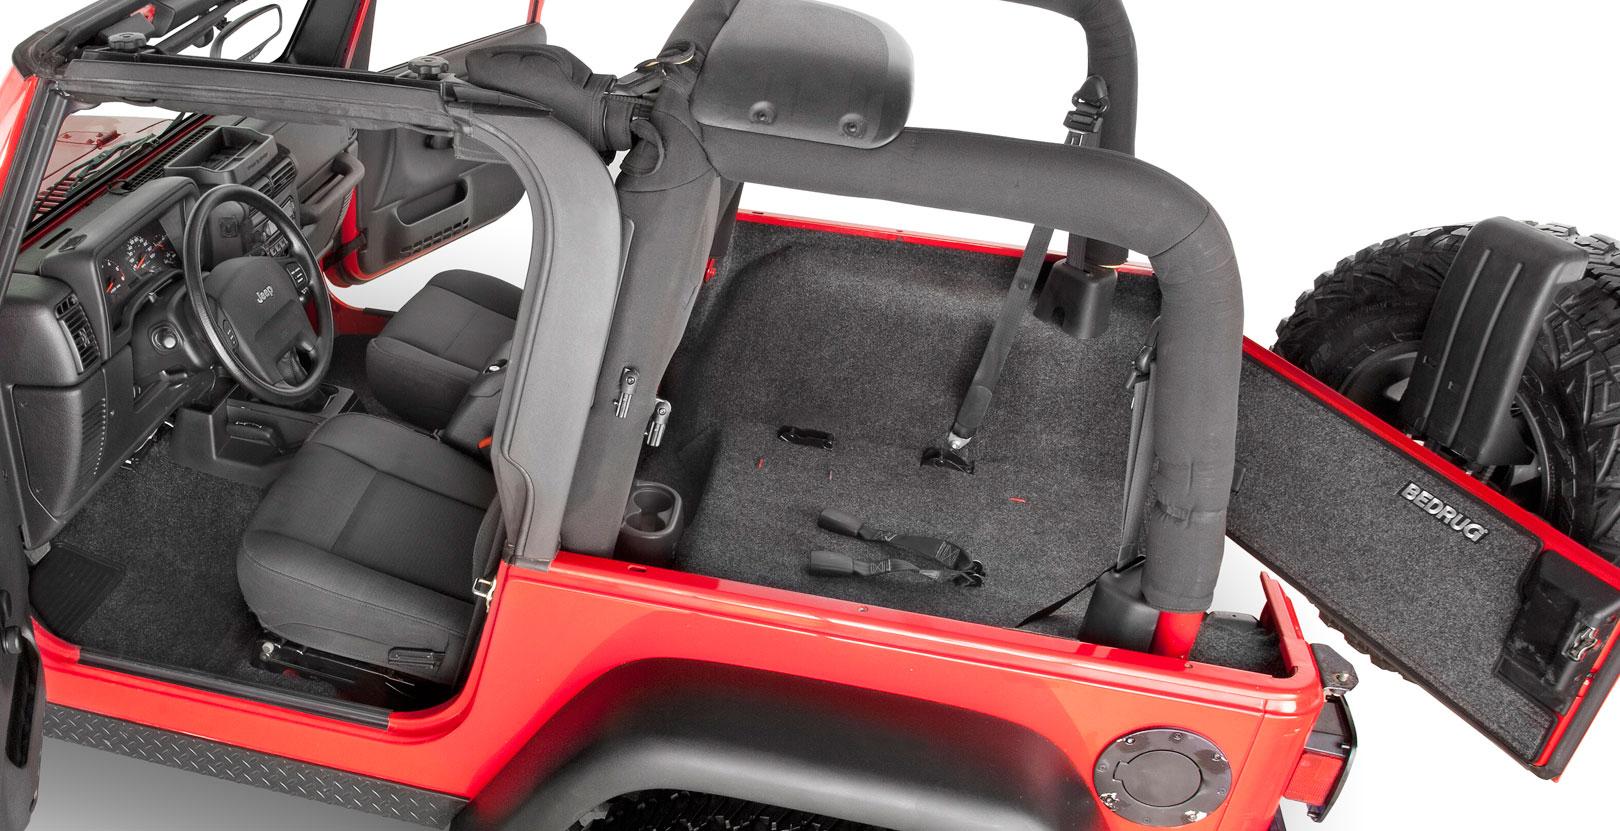 Bedrug jeep carpet bedrug jeep floor liner for Interior jeep accessories